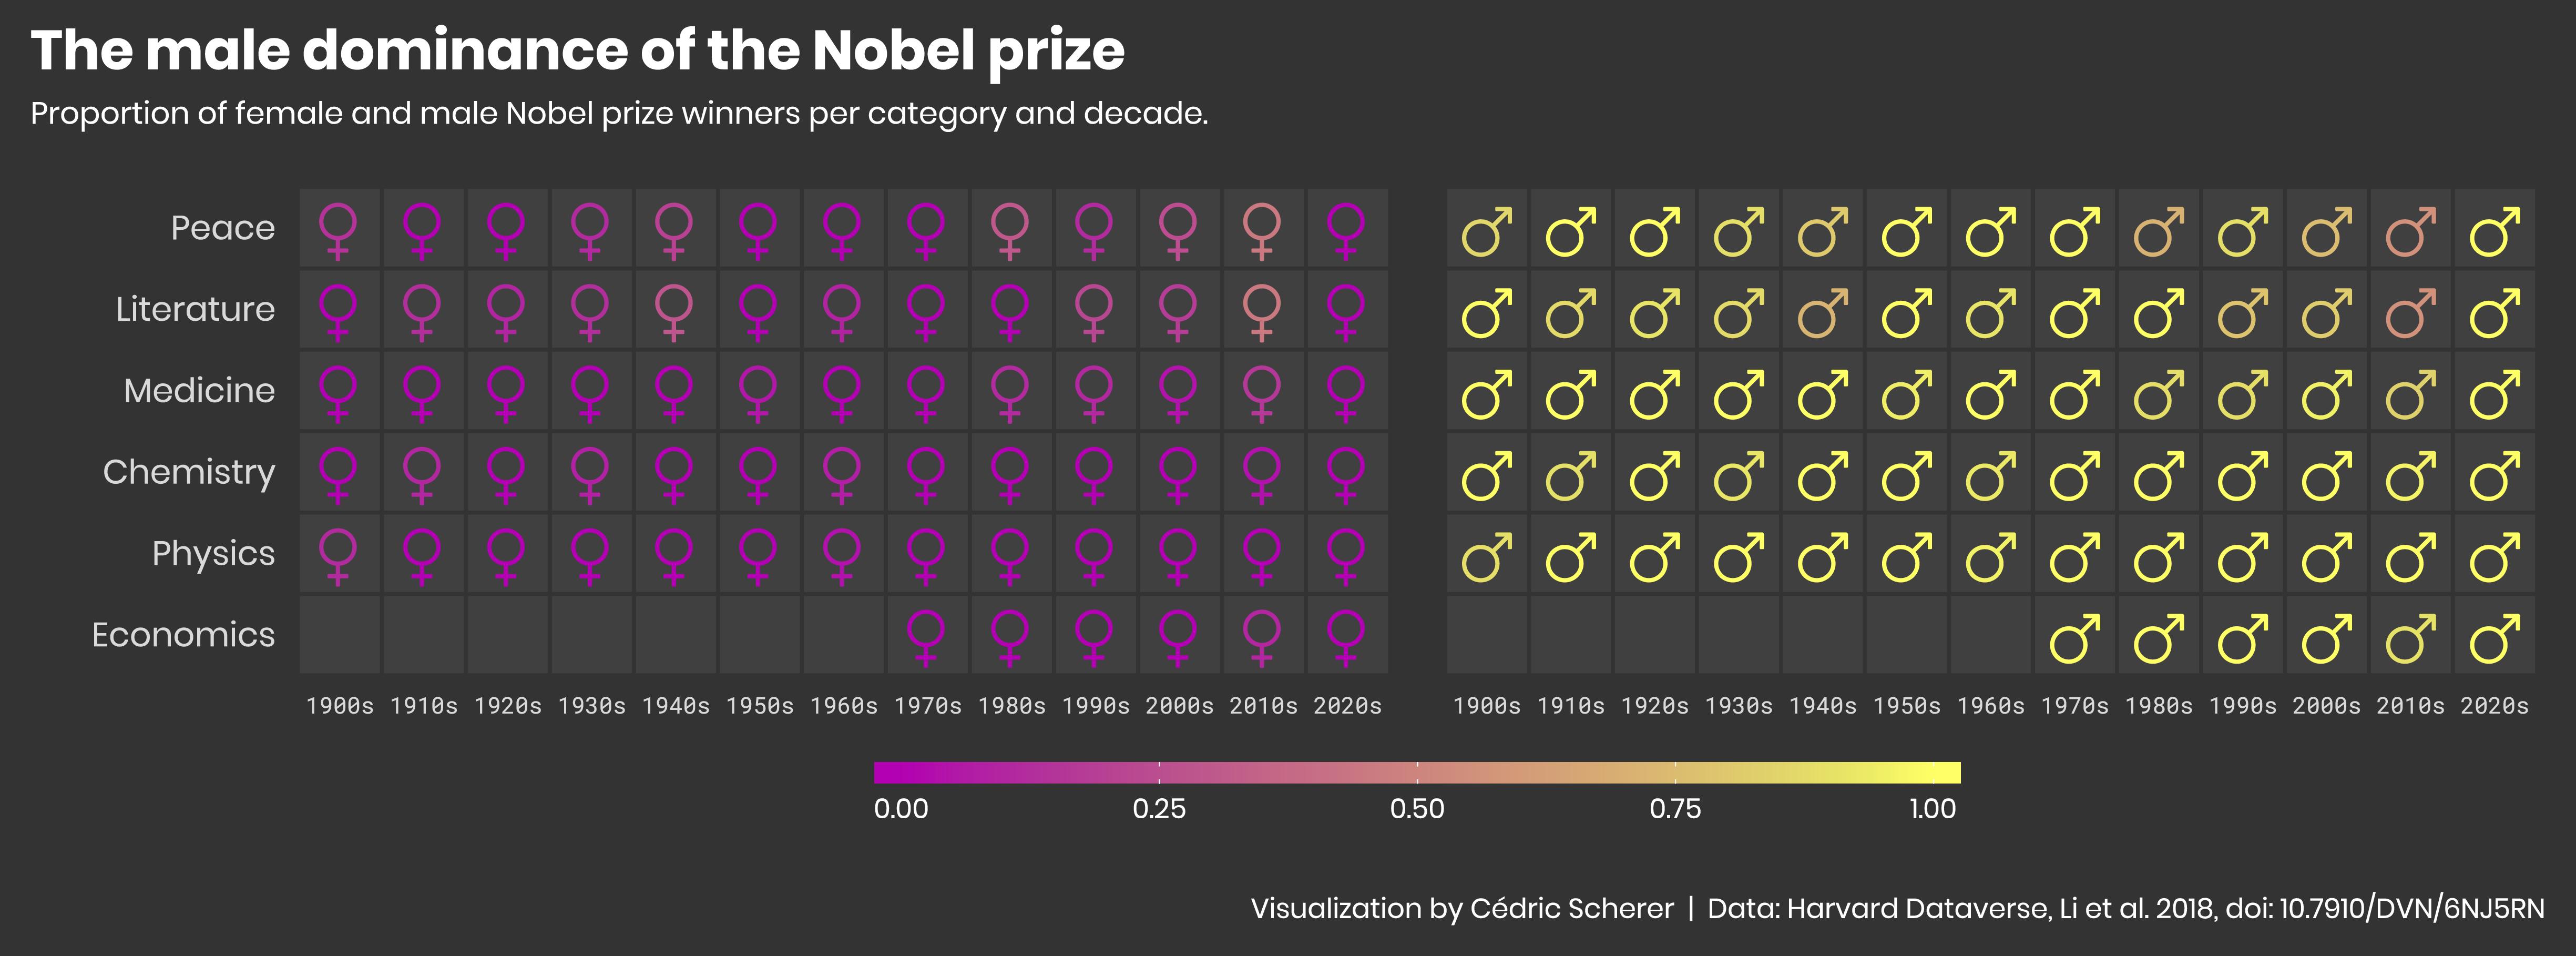 ./plots/2019_20/2019_20_NobelPrizeWinners.png